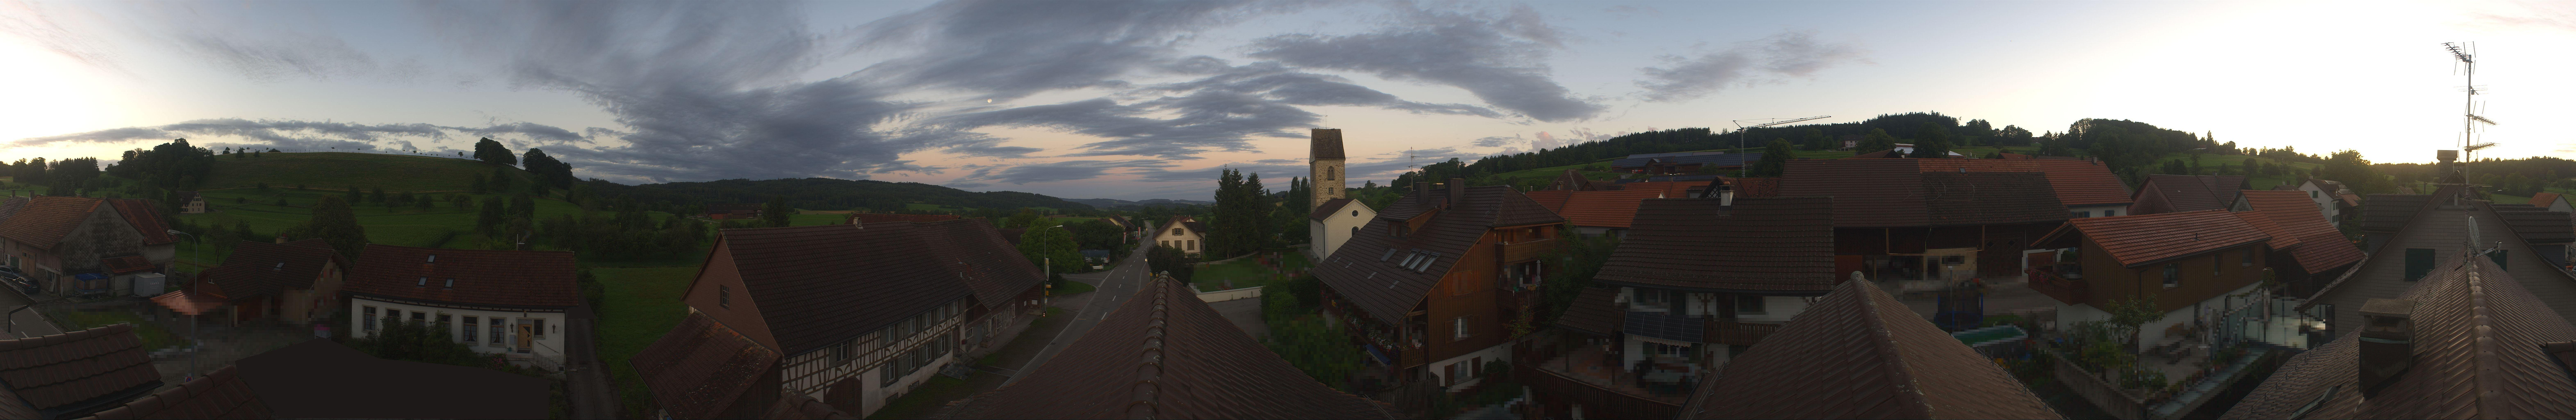 Thundorf: Lustdorf ° Panorama